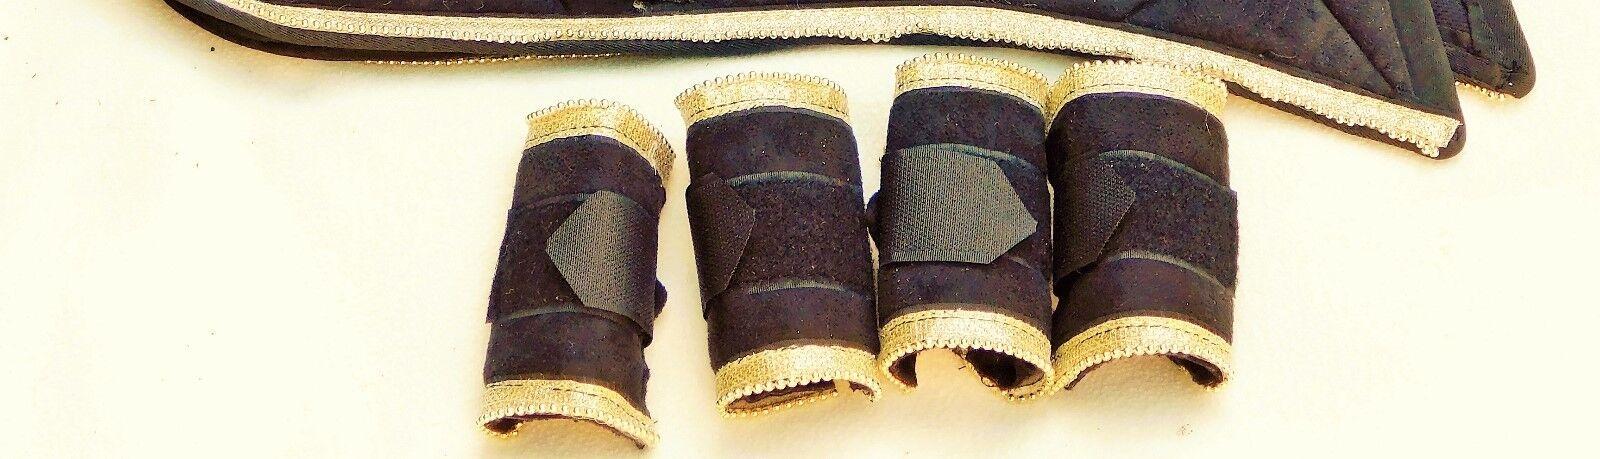 Antik Barock Show Schabracke Beauty Minishetty Shetty Shetty Shetty + 4 Mini Bandagen Tysons cf7571